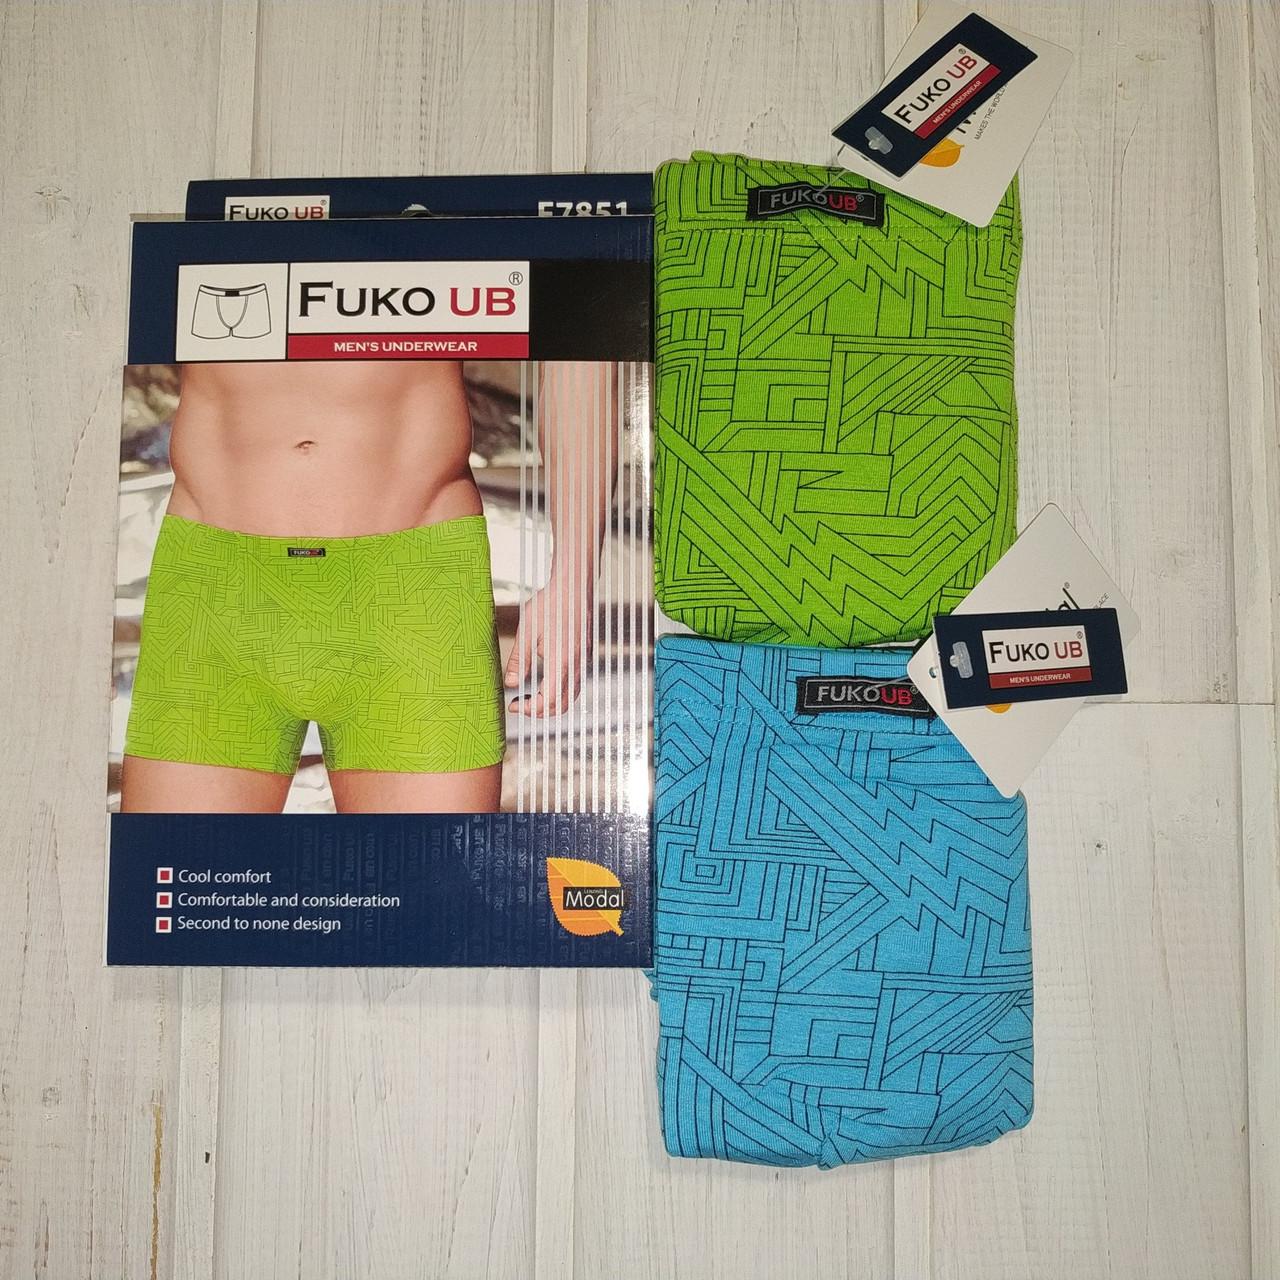 Трусы шорты Fuko Ub 7851  комплект 2шт XXL  бирюзовый и зелёный модал